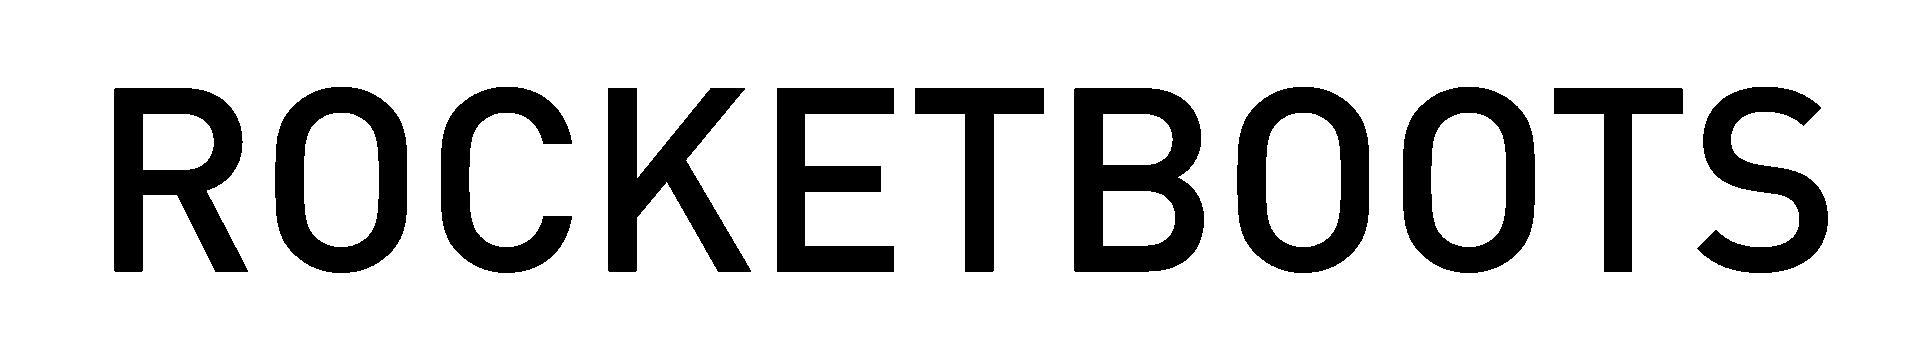 ROCKETBOOTS - PROTOTYPE